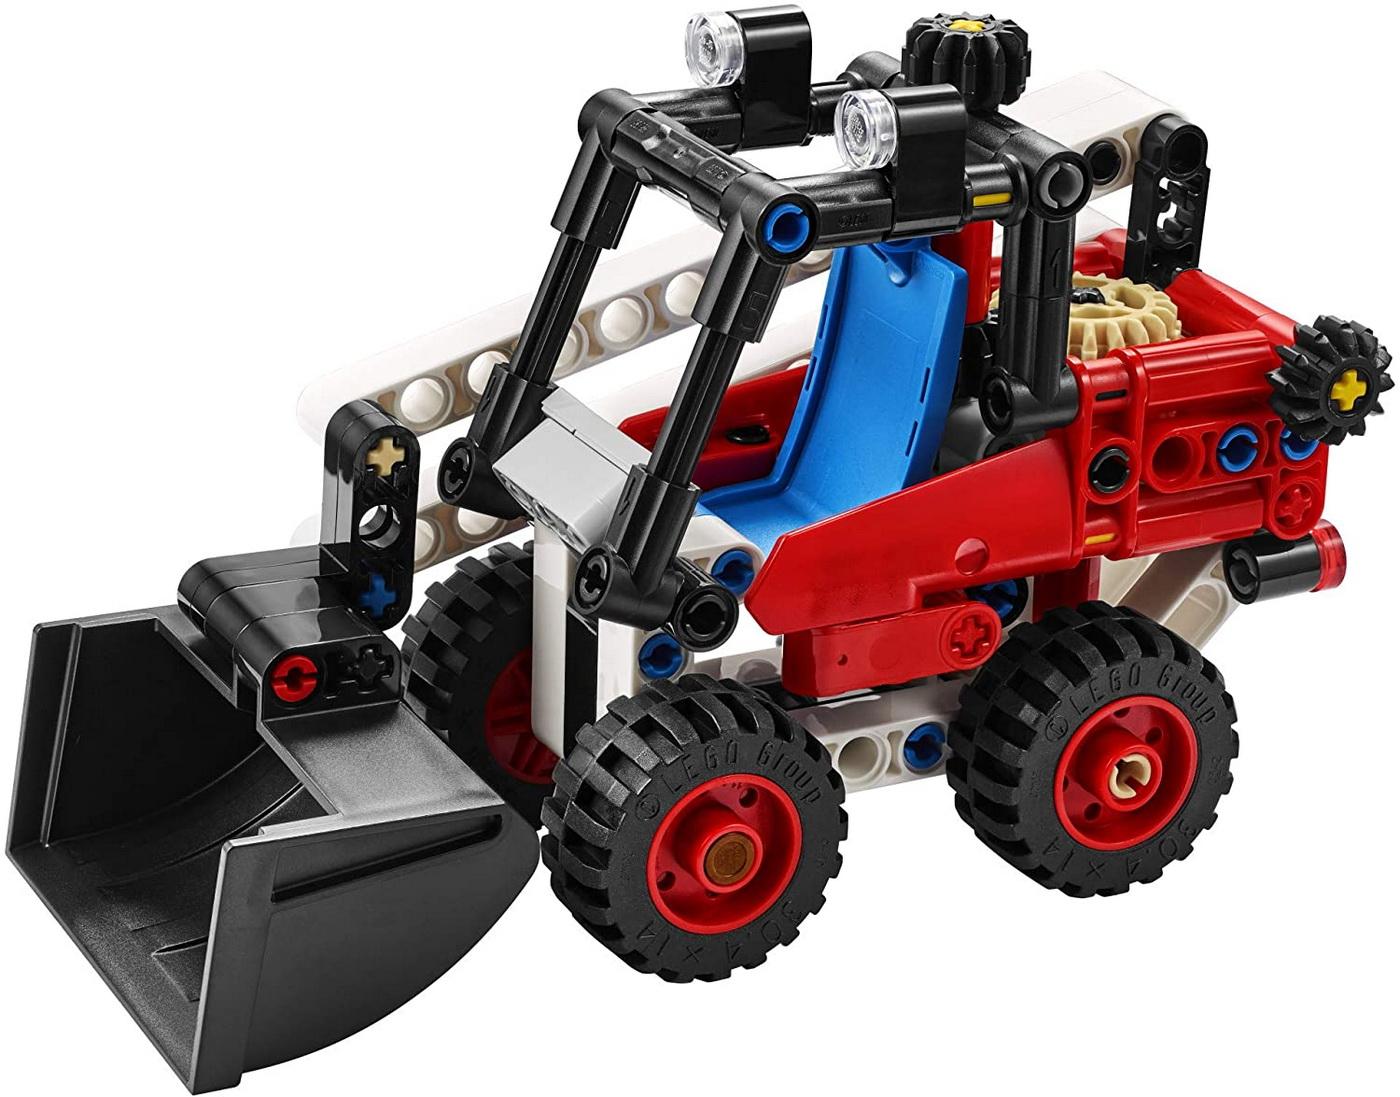 LEGO Technic - Skid Steer Loader (42116)   LEGO - 5